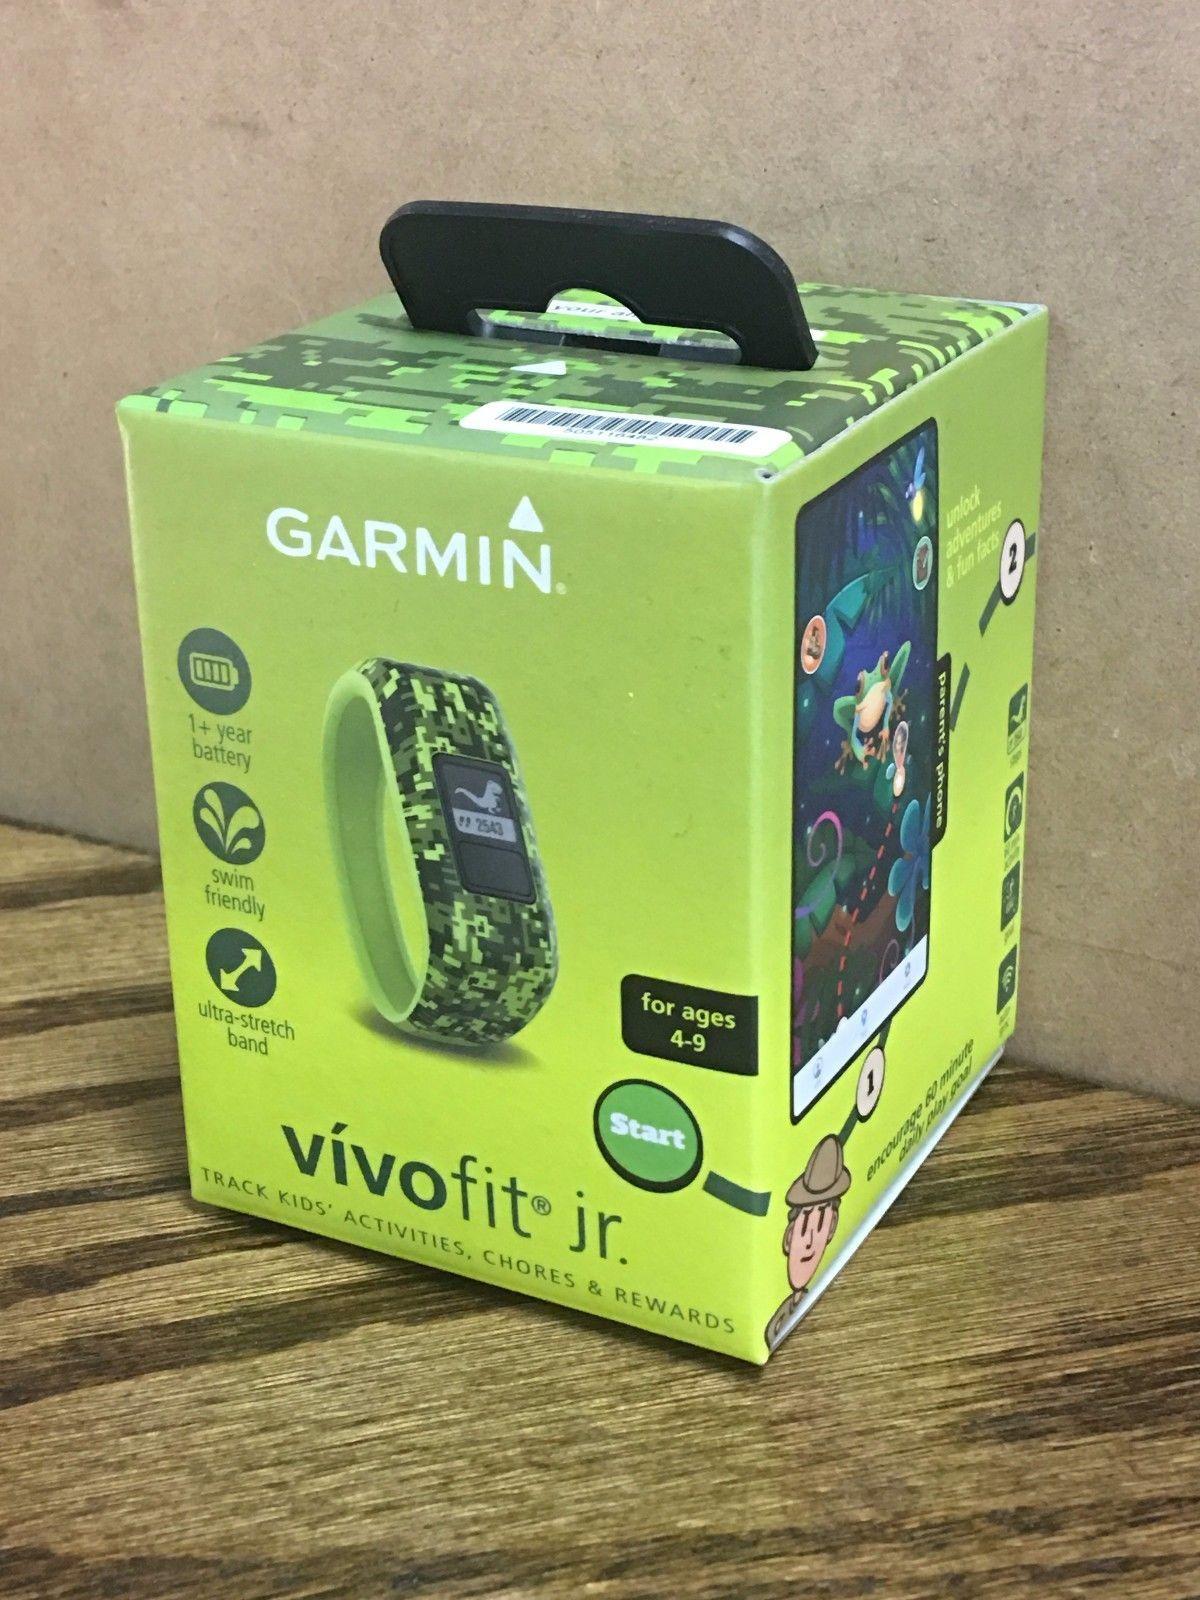 Camo Green  Age 4-9 New Garmin vivofit Jr Kids Activity Chore Tracker